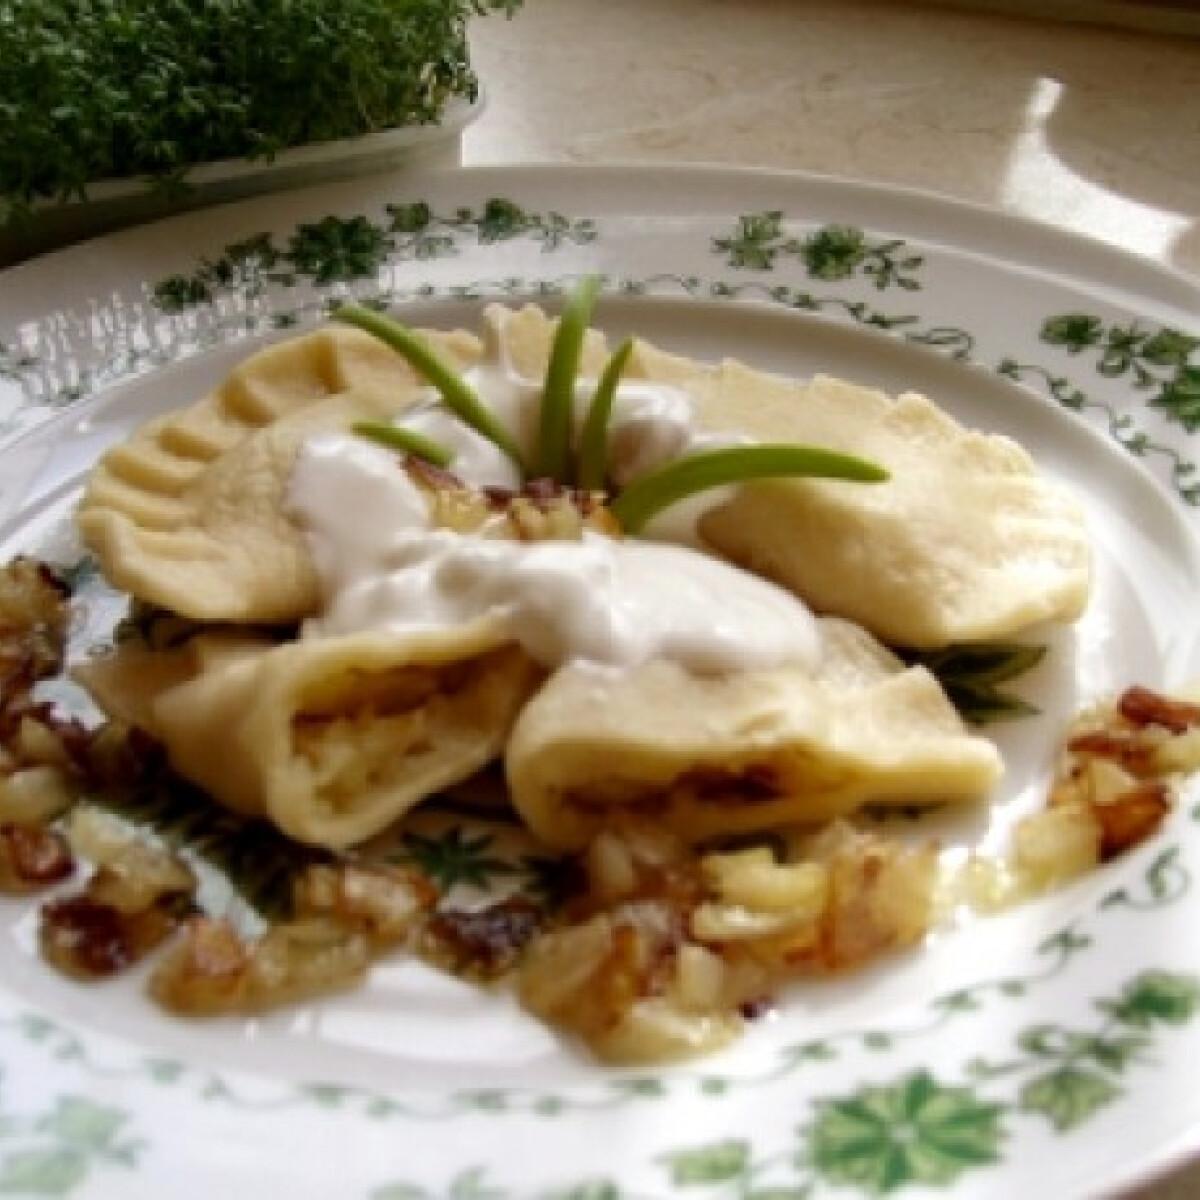 Ezen a képen: Varenyiki krumplis derelye